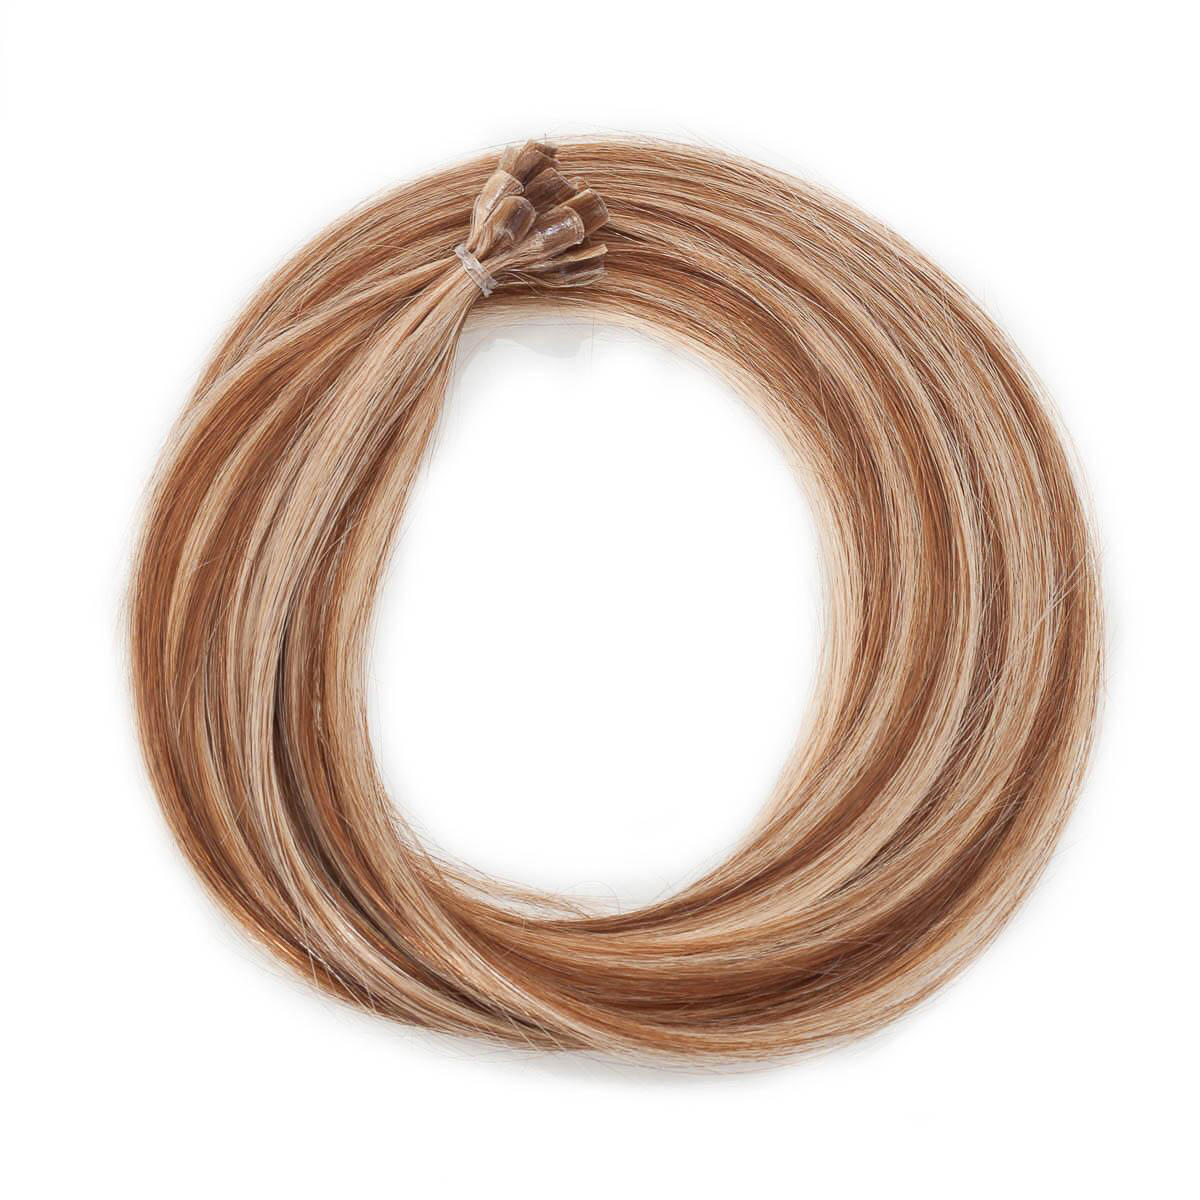 Nail Hair M5.4/7.8 Strawberry Brown Mix 50 cm